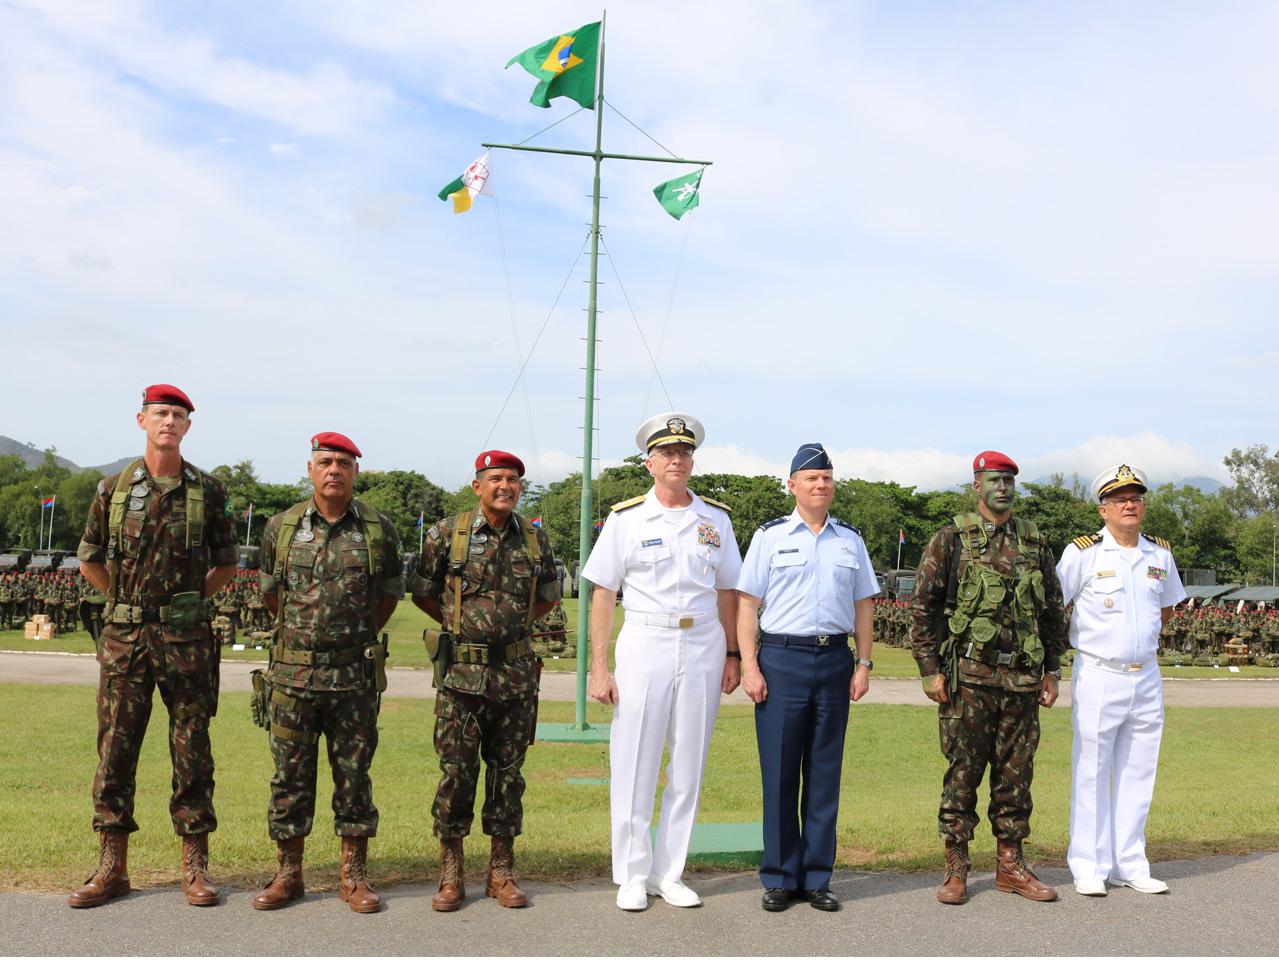 Comandante do Sul dos Estados Unidos conhece peculiaridades da Brigada de Infantaria Pára-quedista